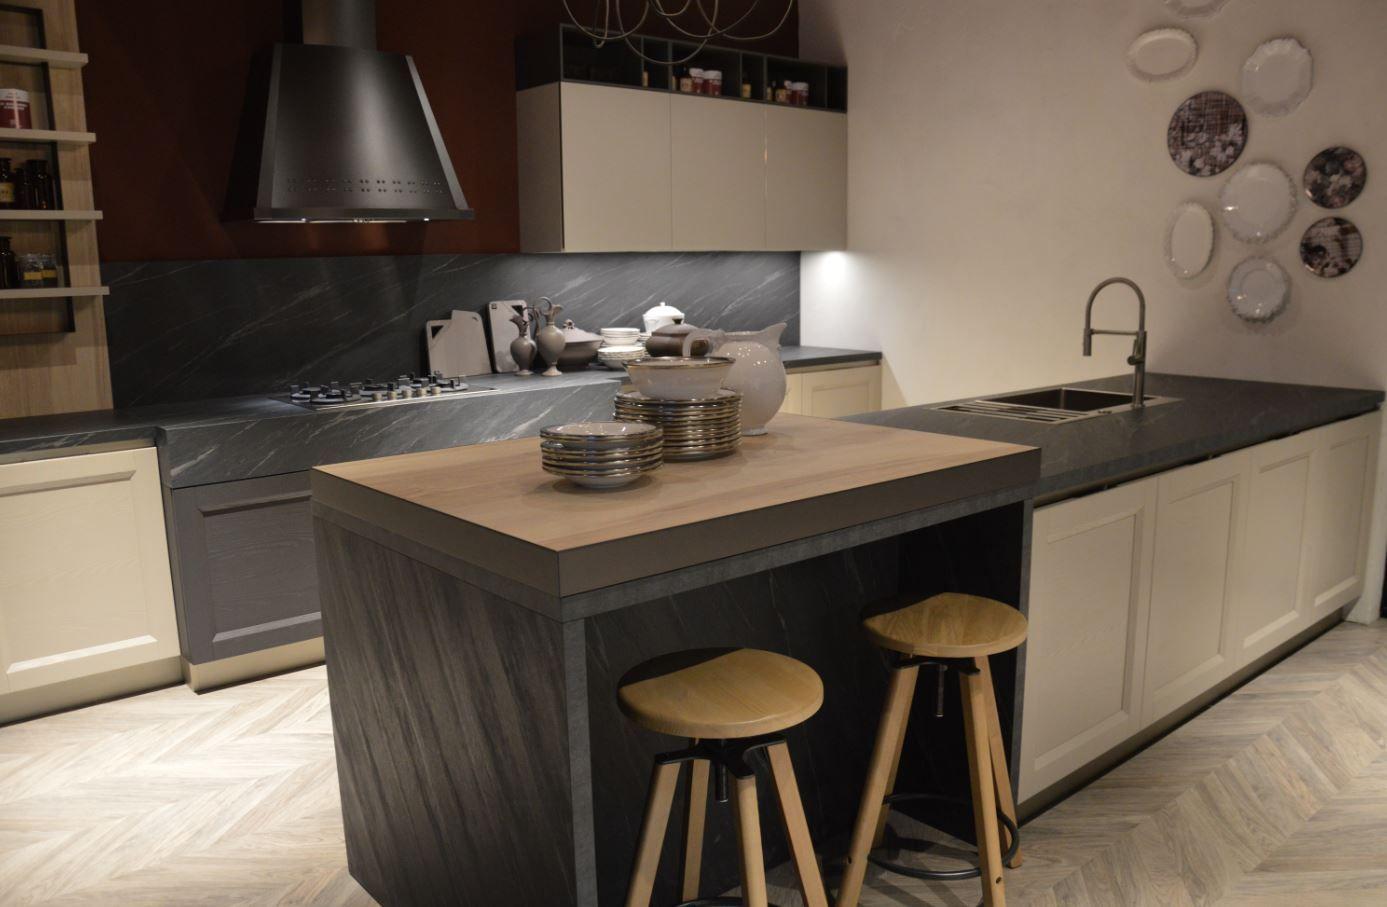 Tavolo Calypso Veneta Cucine.Kitchen Design By Stosa Cucine Material Hpl By Arpa